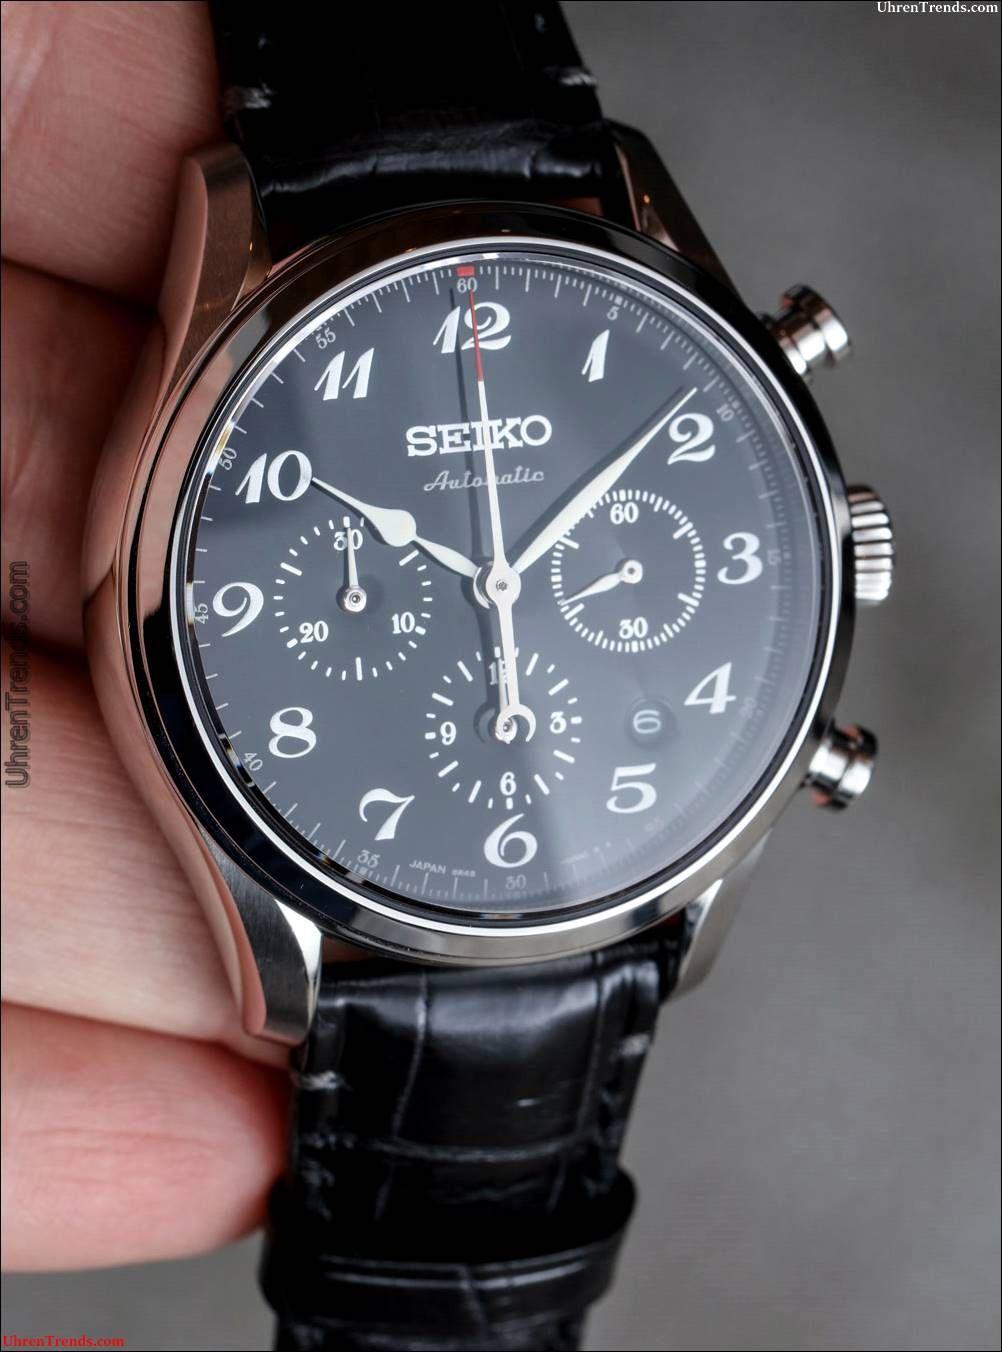 a9a2c242871 Seiko Presage Automatik Chronograph SRQ019   SRQ021 Limited Edition Uhren  Hands-On  automatik